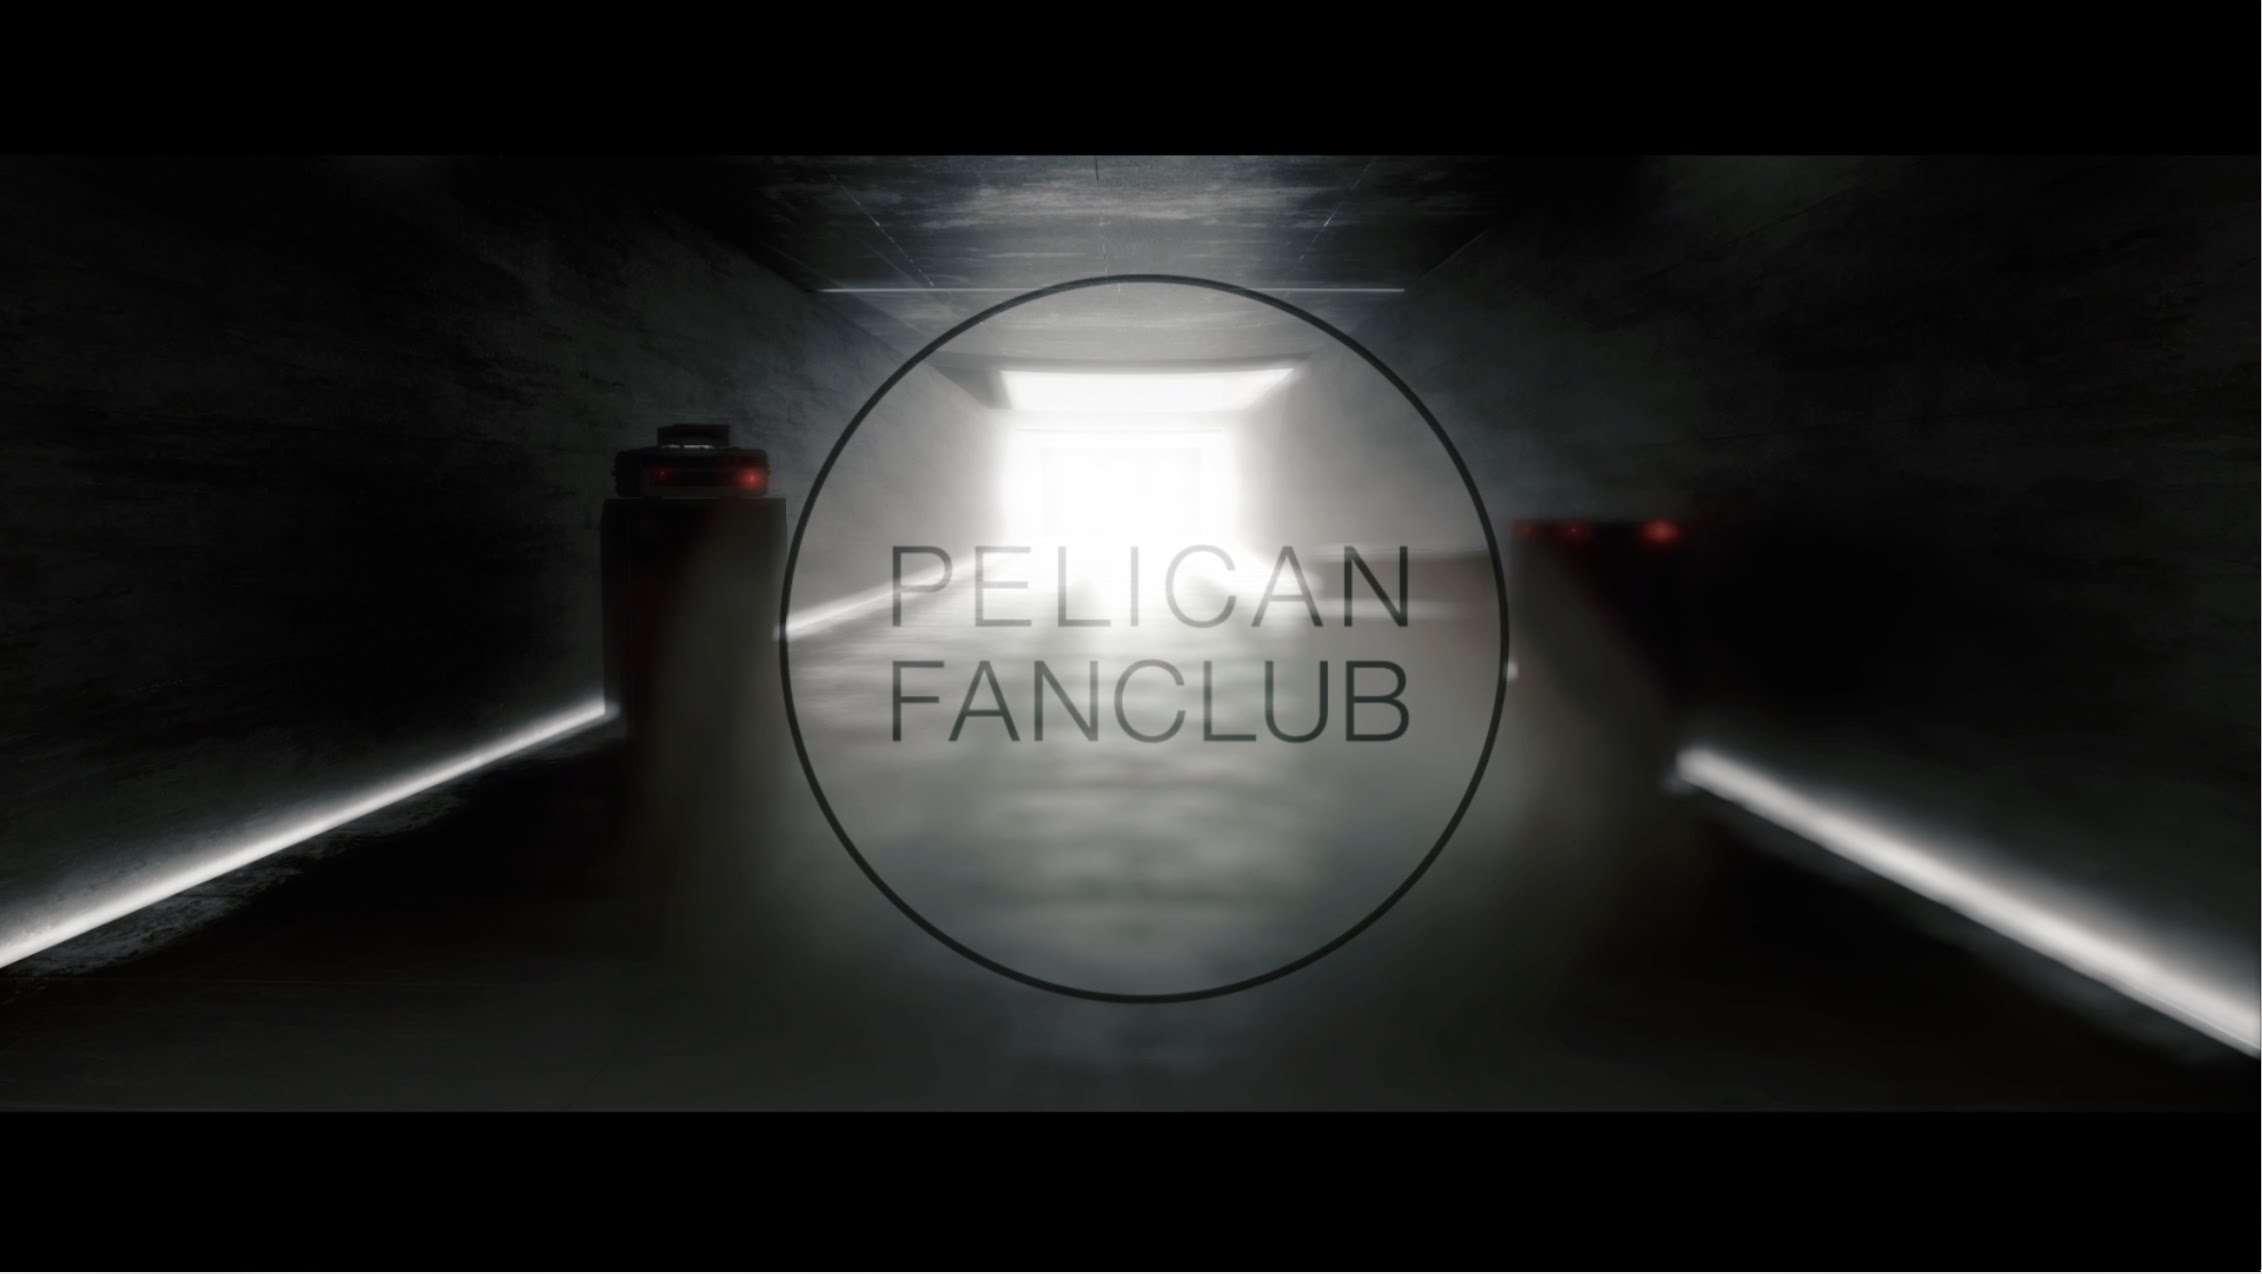 PELICAN FANCLUB - 説明(MV) × ZUKUNLAB. 東映ツークン研究所 - YouTube